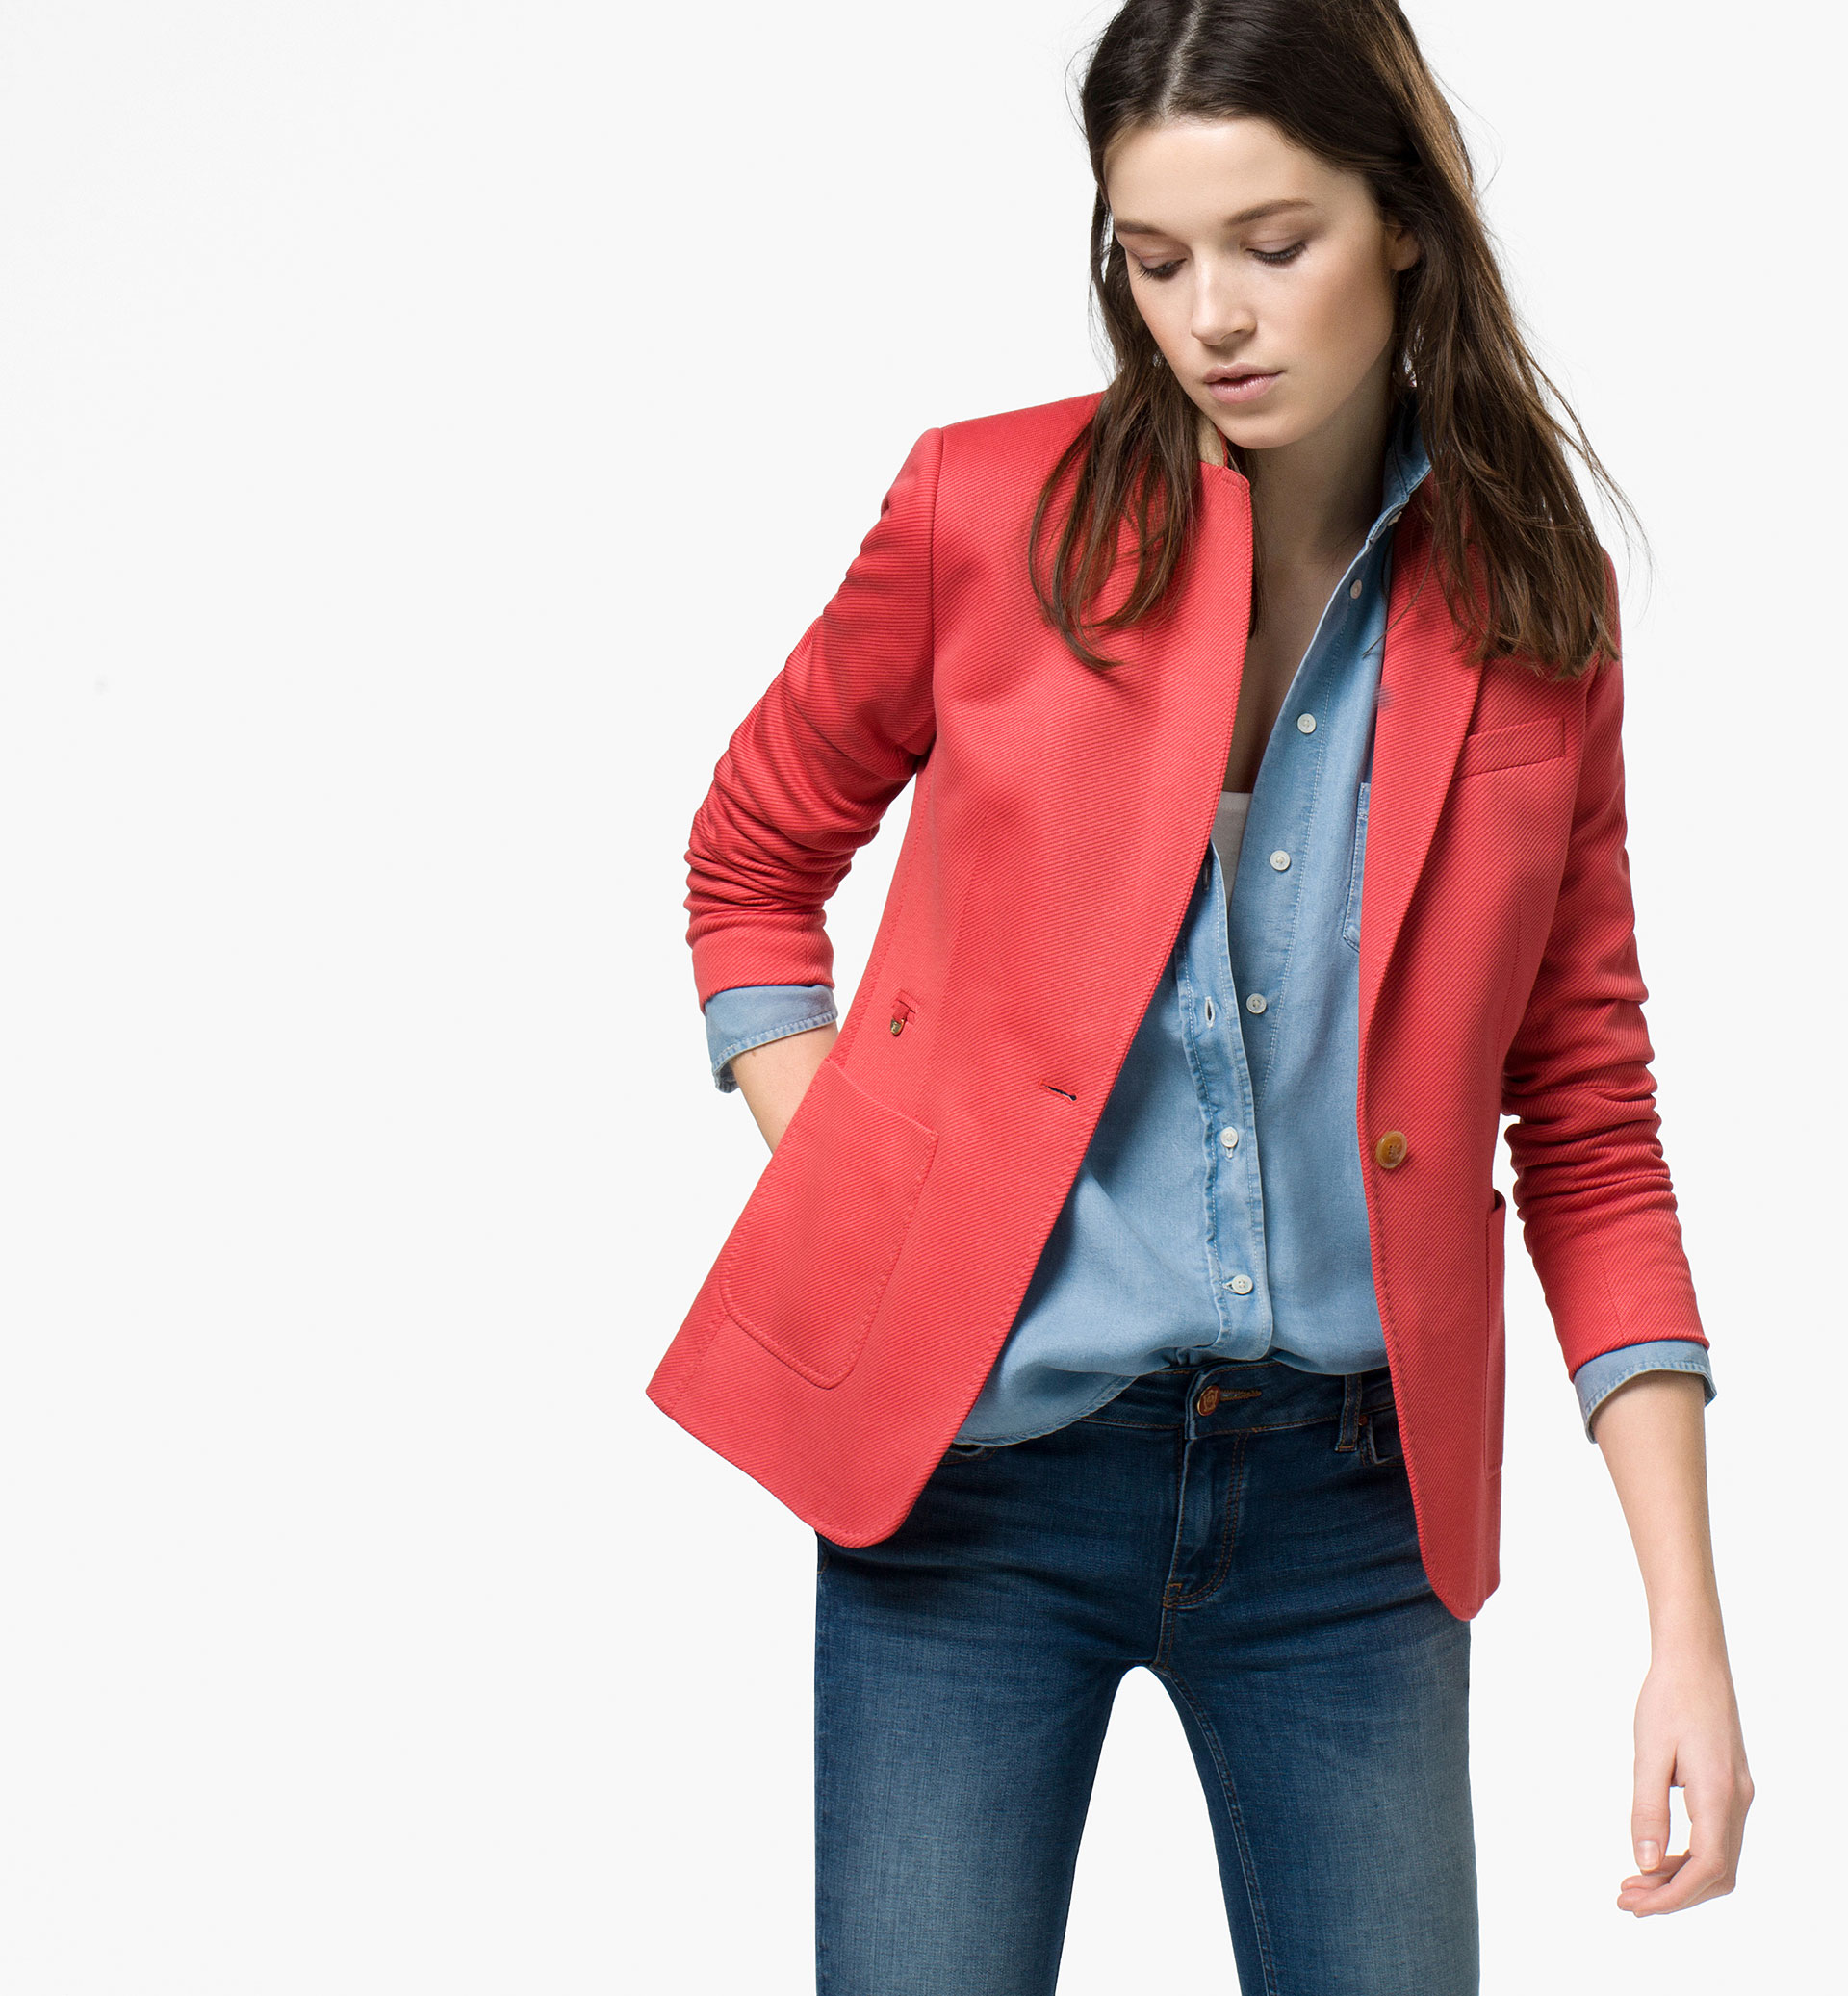 Tendance veste cuir femme 2015